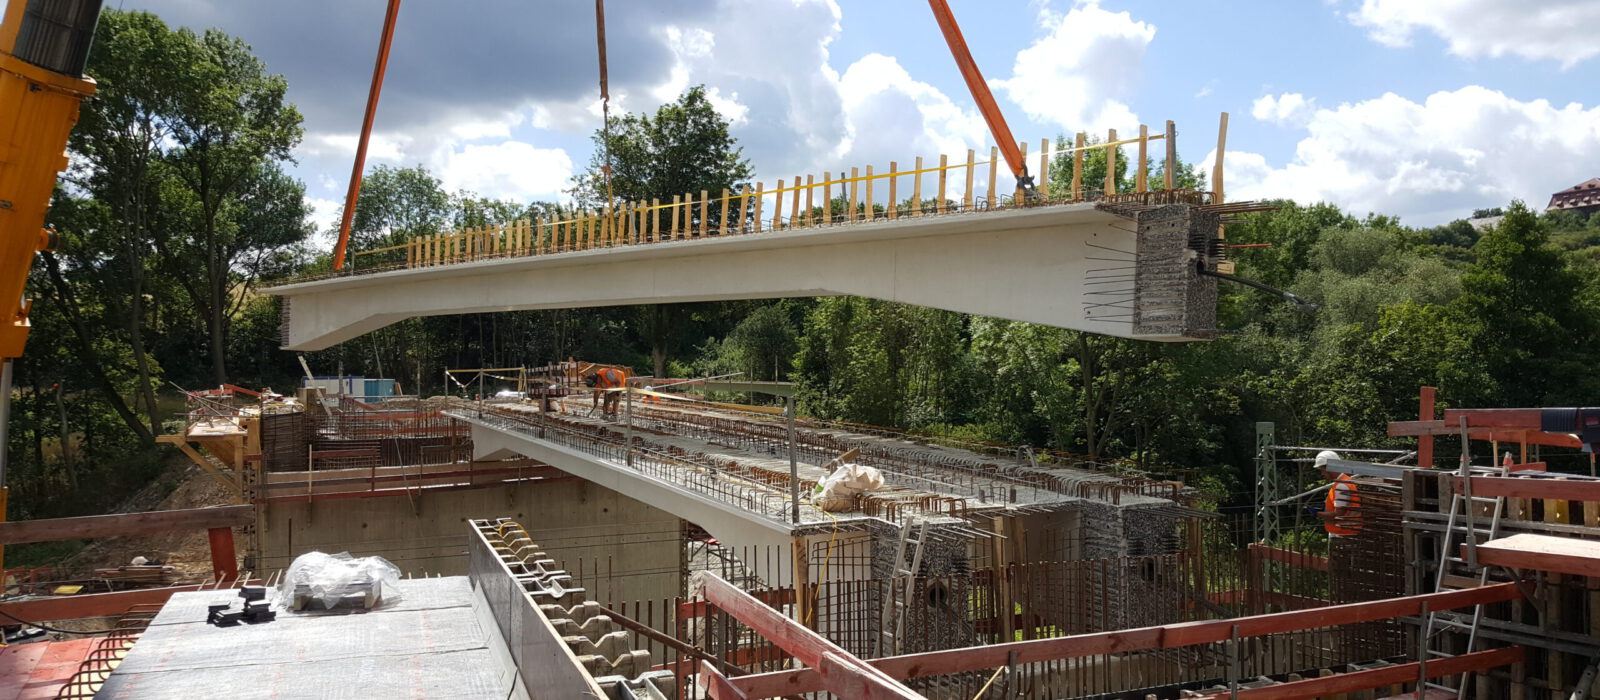 Baustelle Neu Eichenberg - beck-bau